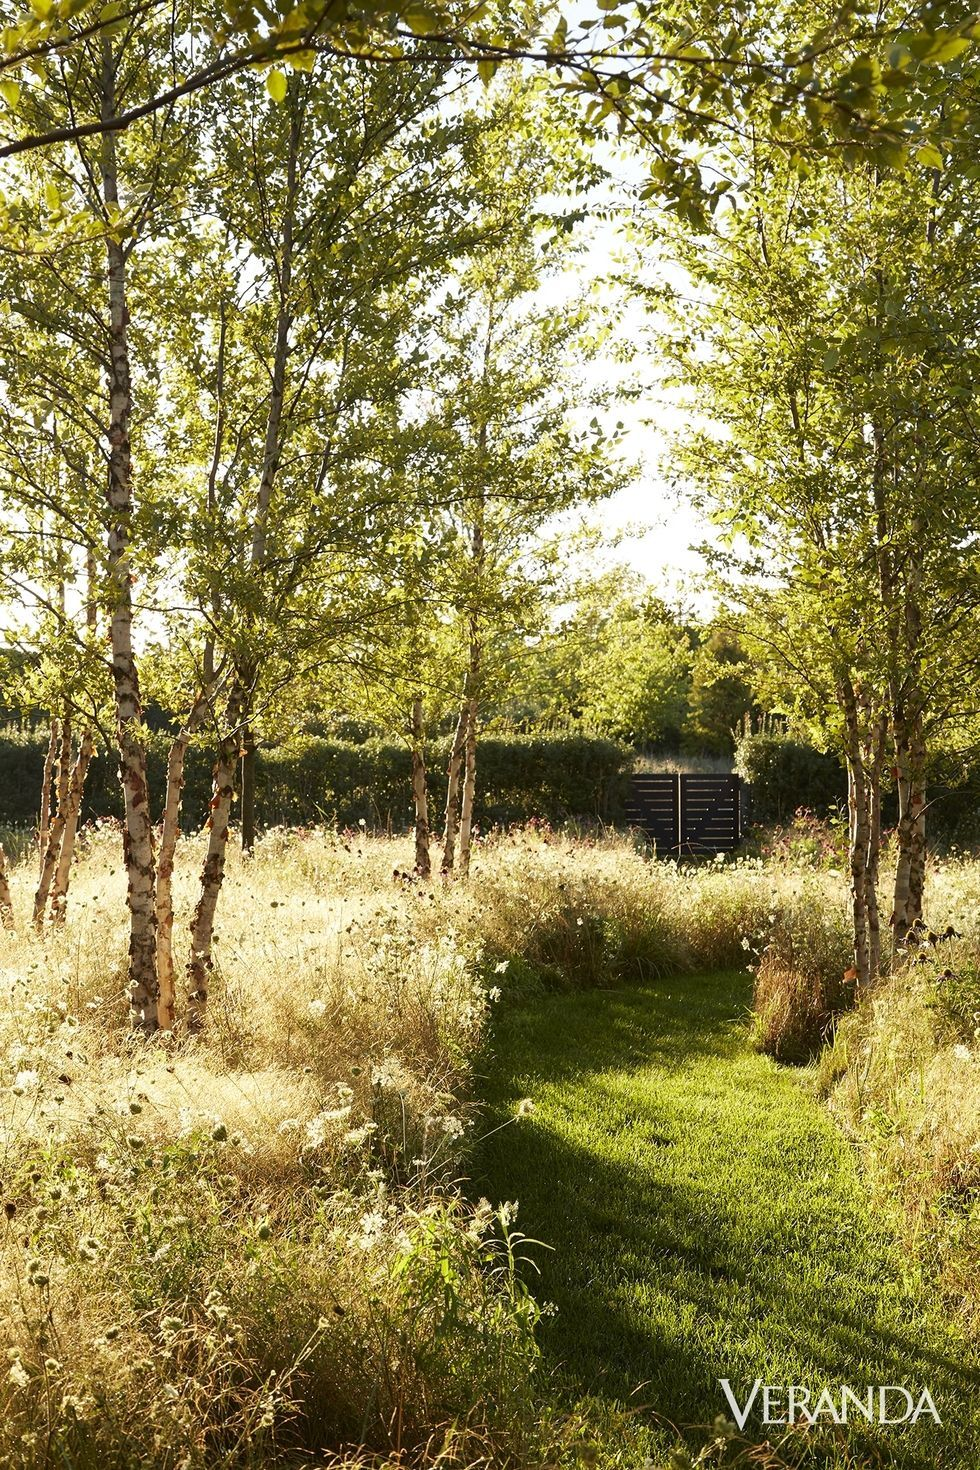 22 Stunning Landscaping Ideas - Landscape Designs for Front Yards ...